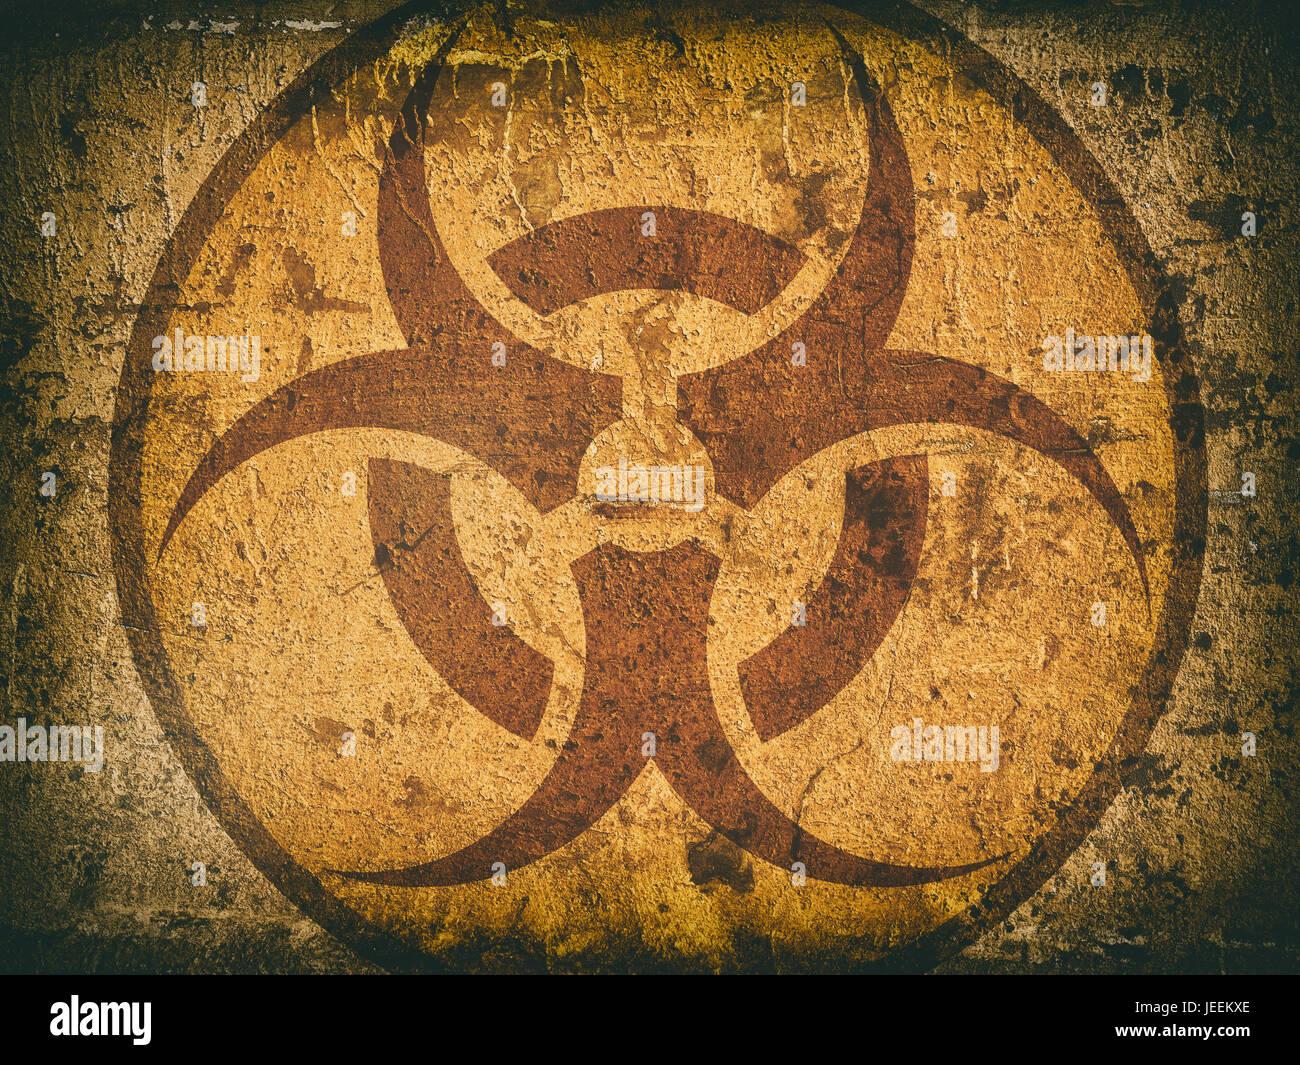 bio hazard symbol on a cracked stone wall. Grunge background Stock Photo